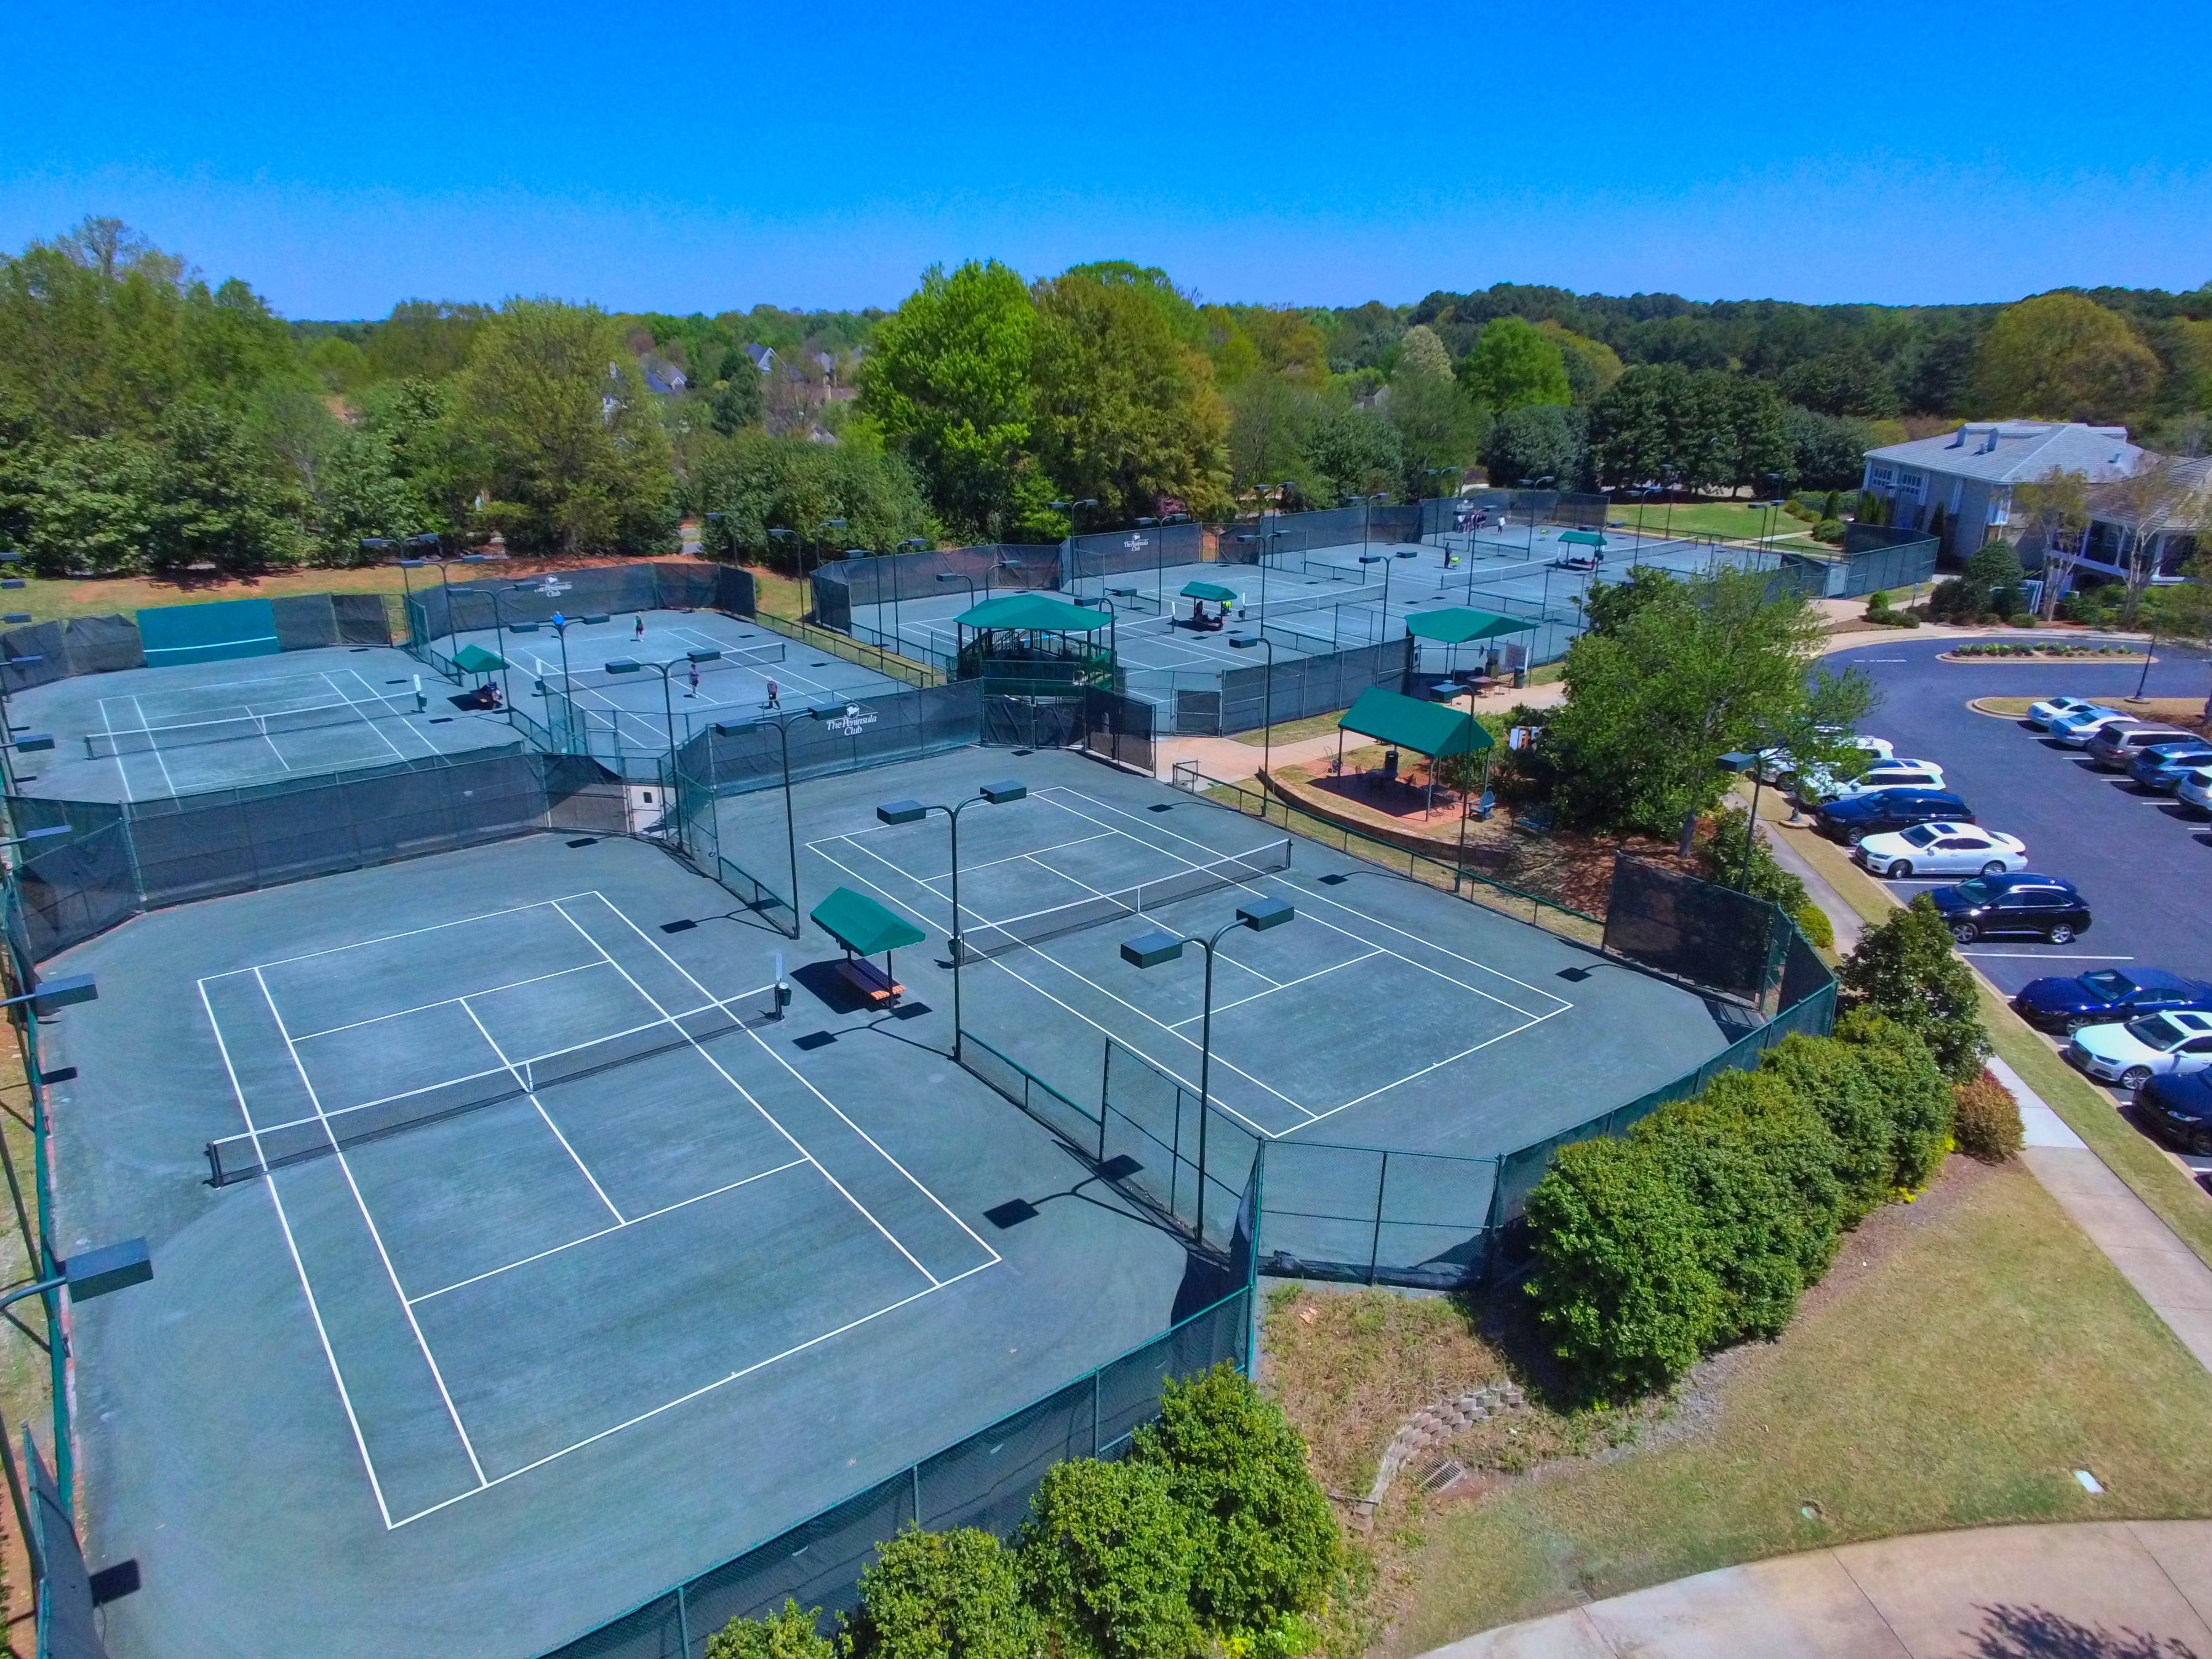 Peninsula Tennis Courts